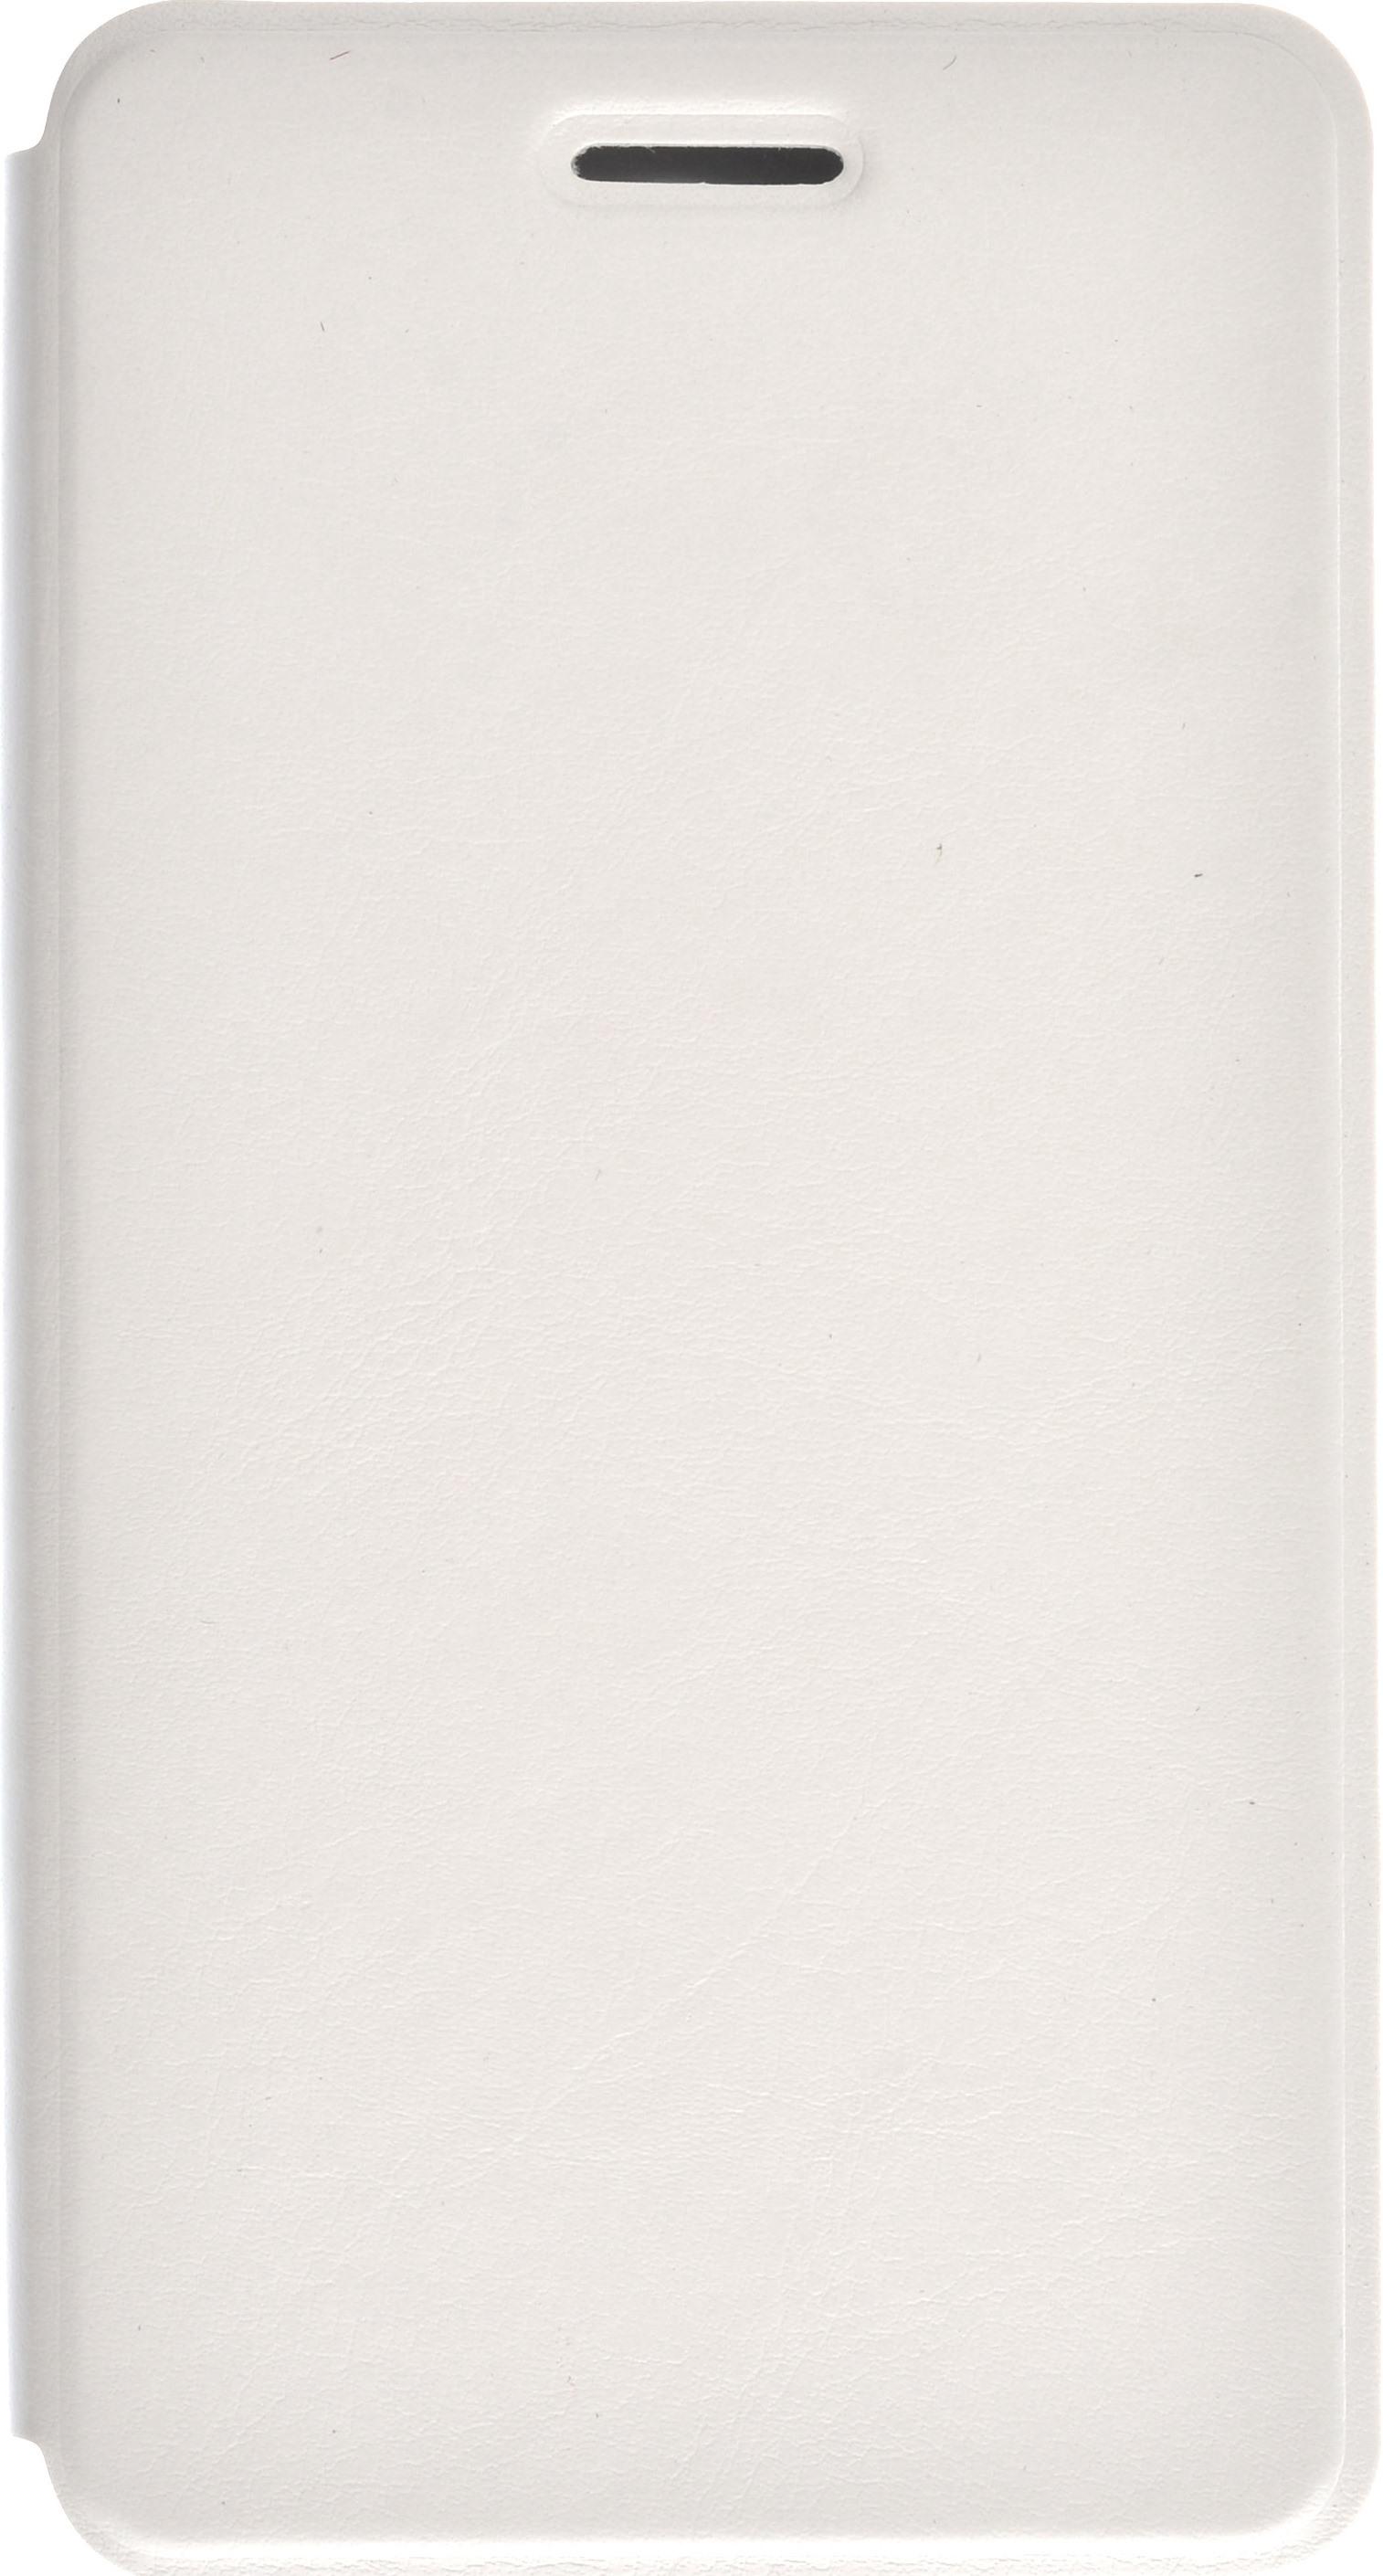 Чехол для LG Max X155 Lux skinBOX, белый чехол для сотового телефона skinbox lux 4660041407143 черный